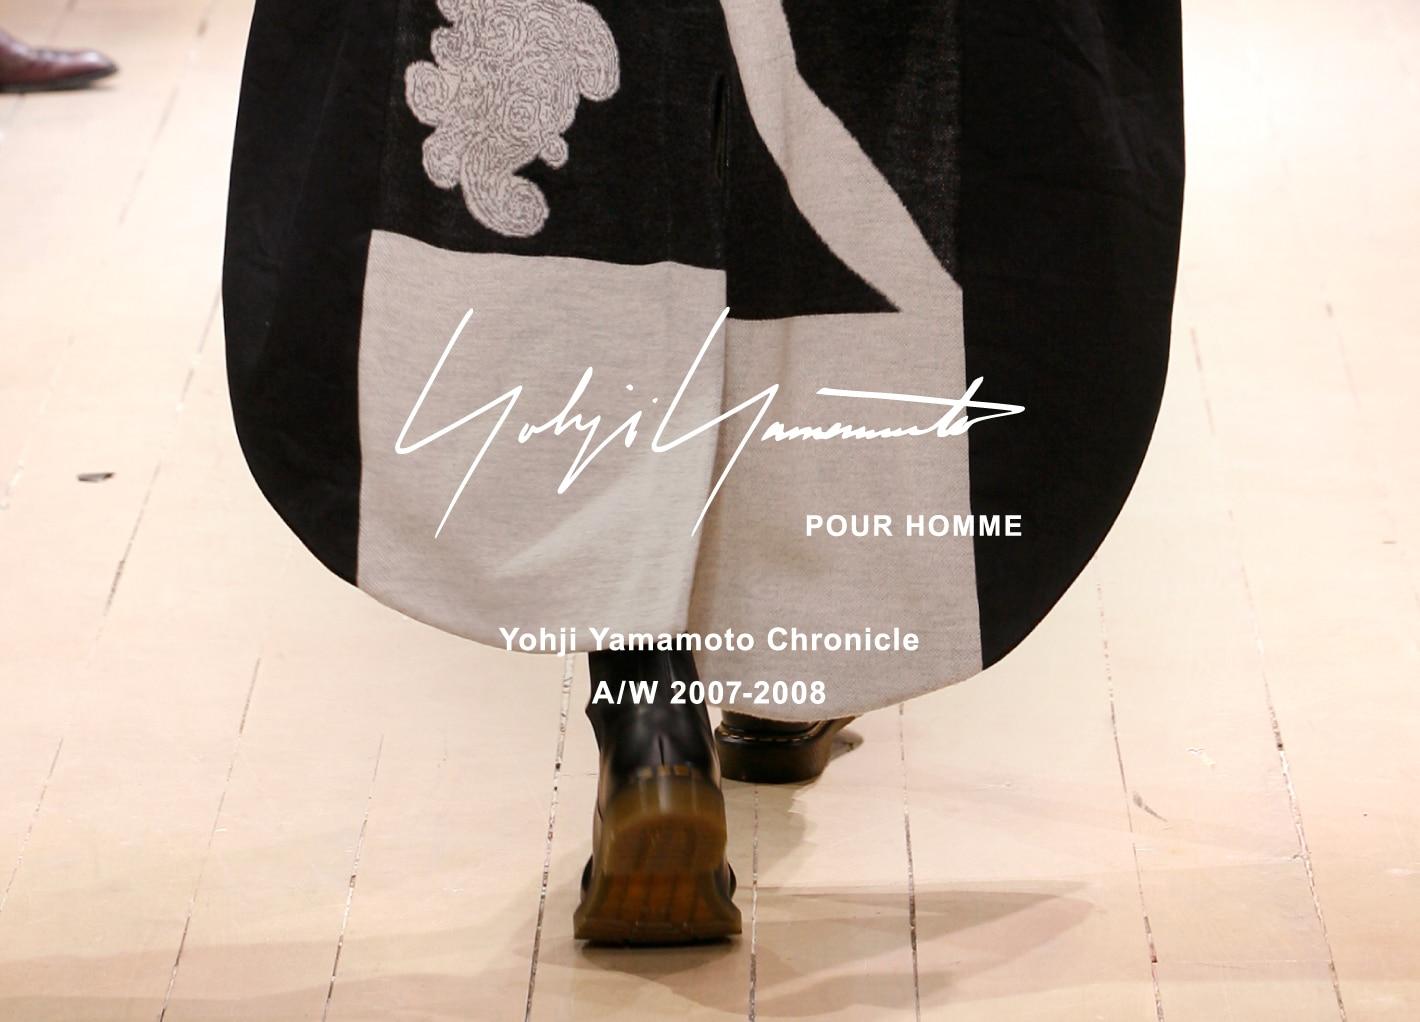 Yohji Yamamoto Chronicle – POUR HOMME AW 2007